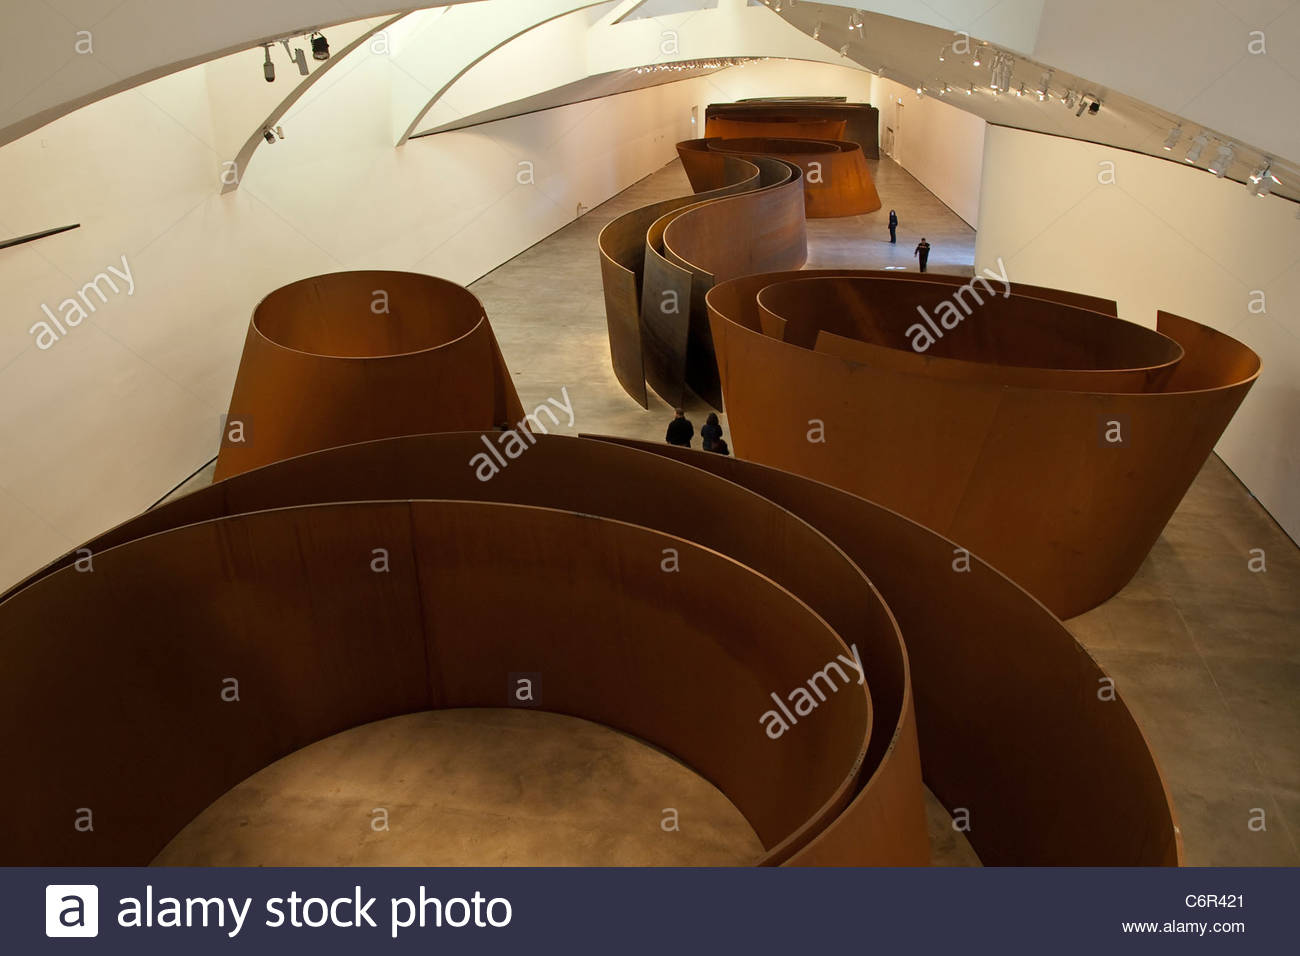 Frank Gehry's Fish space at Guggenheim Bilbao museoa, Bilbao, Basque country, Euskadi, Spain. Stock Photo